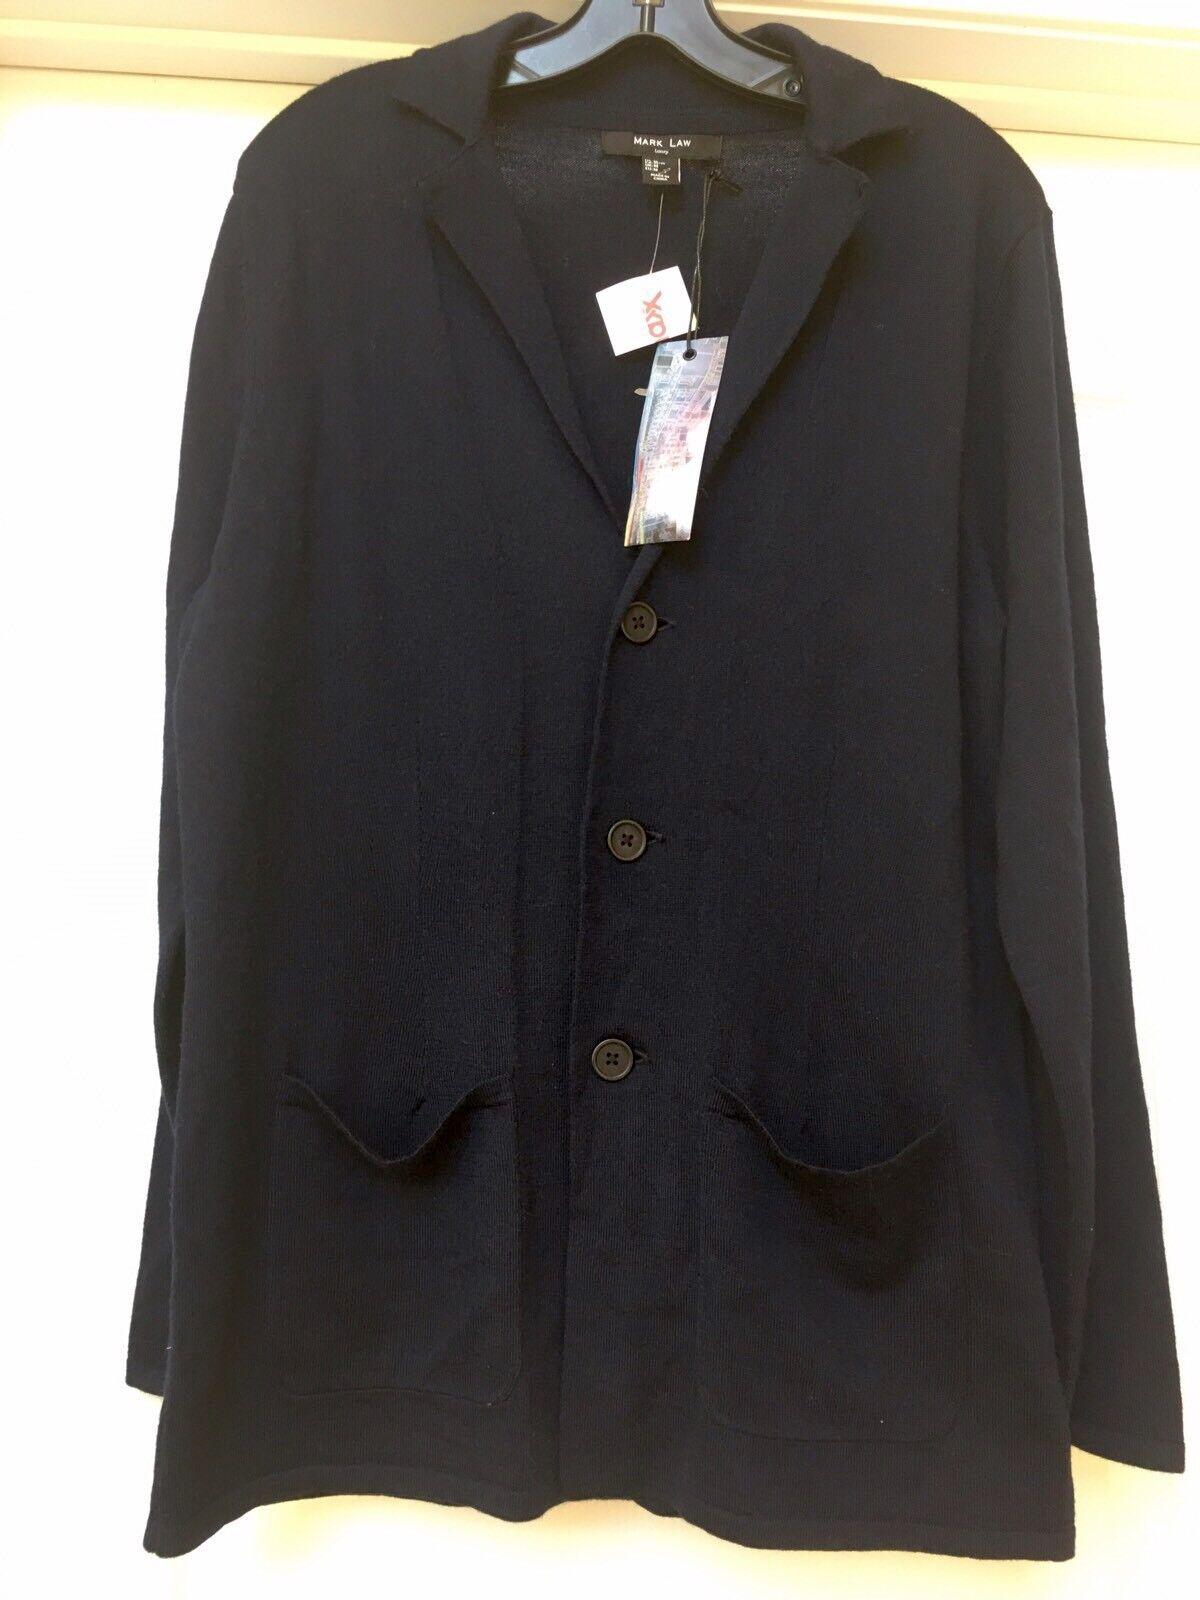 Mark Law Luxury Wool Blend  Navy bluee Cardigan Sweater Mens , Size M.    NWT